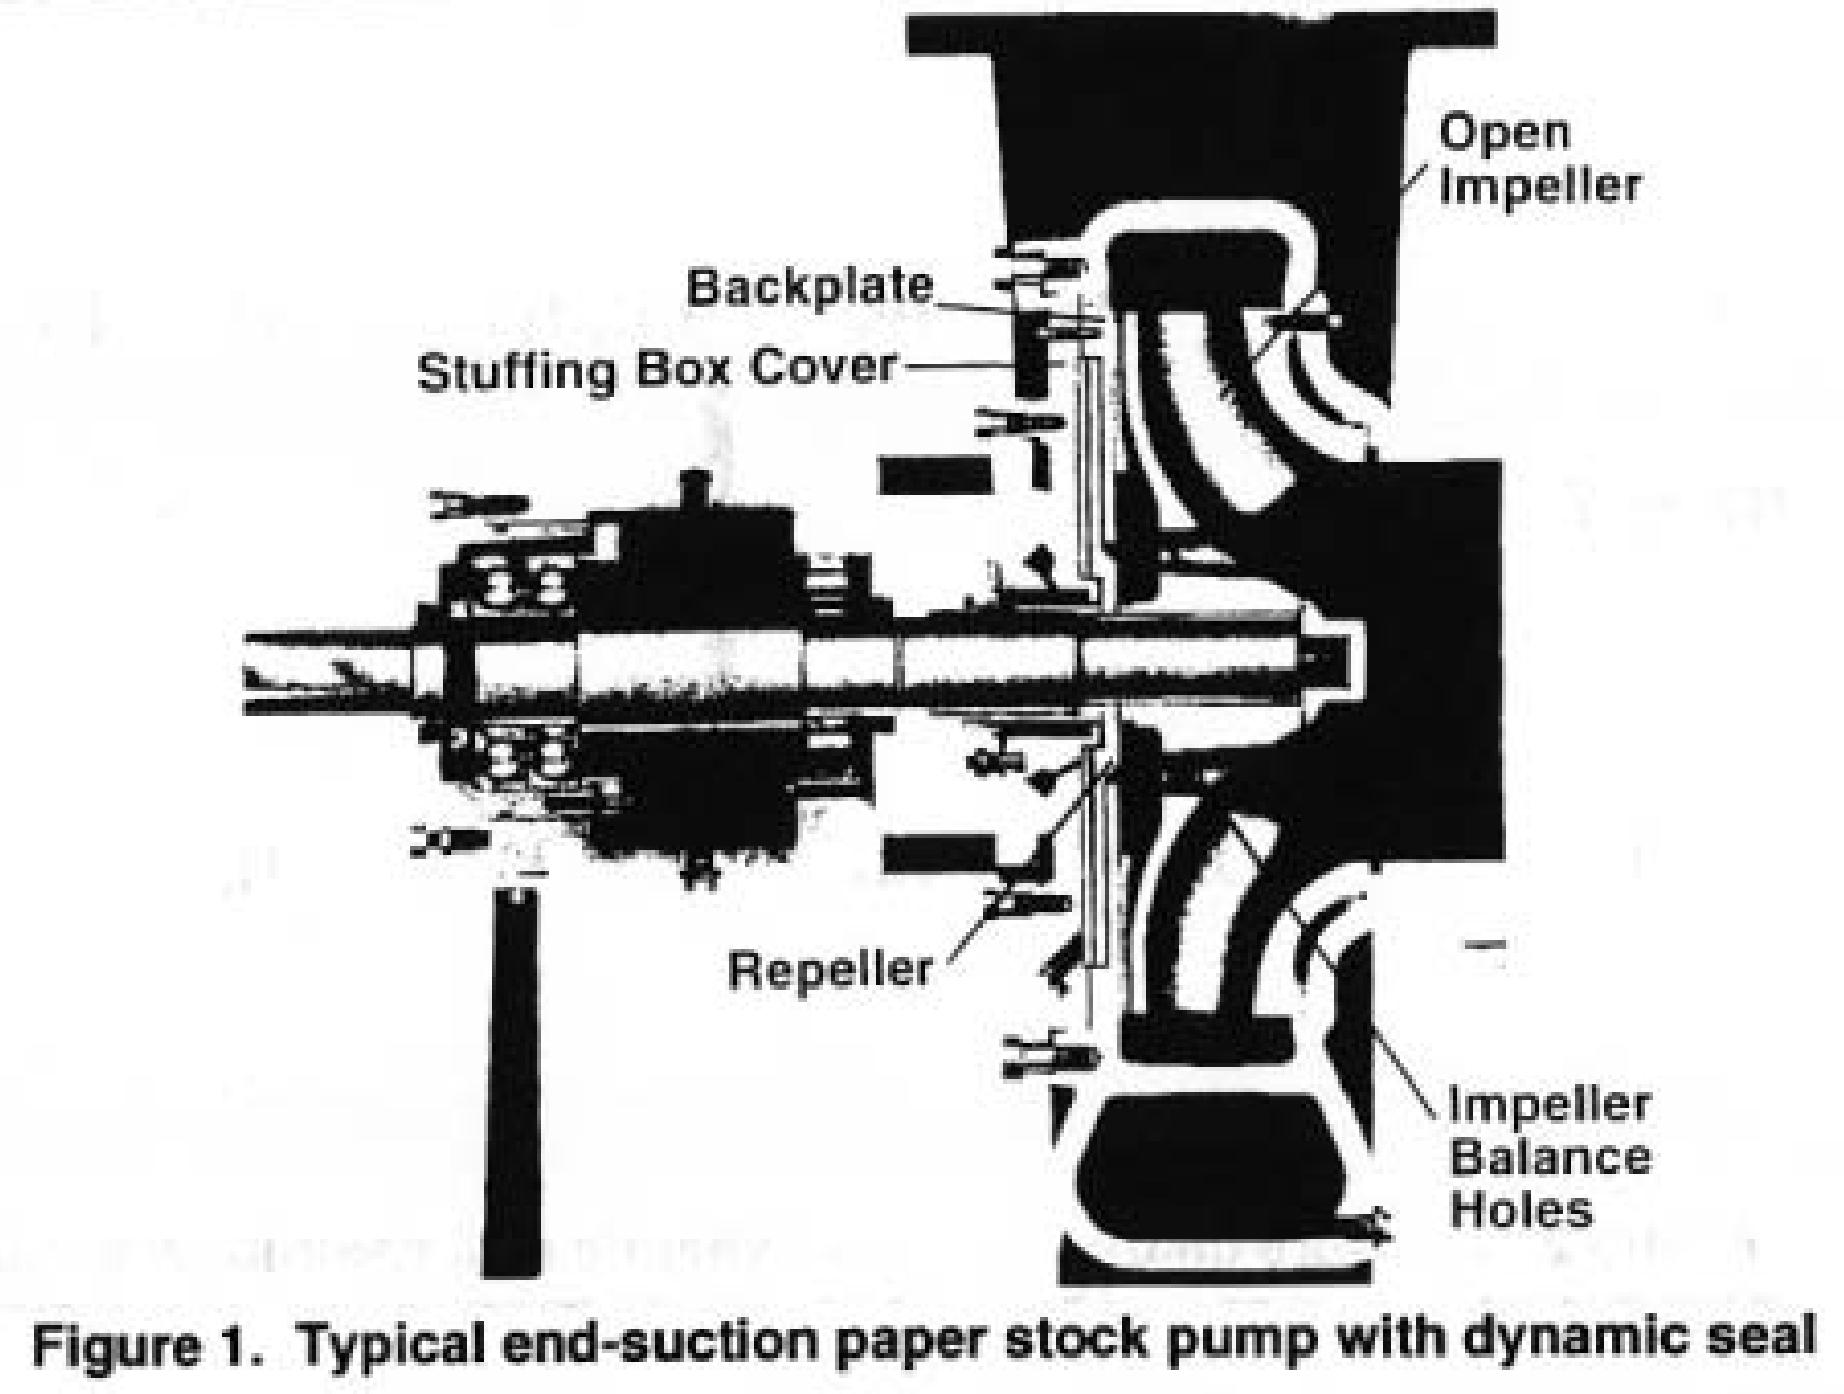 centrifugal pumps figure 1